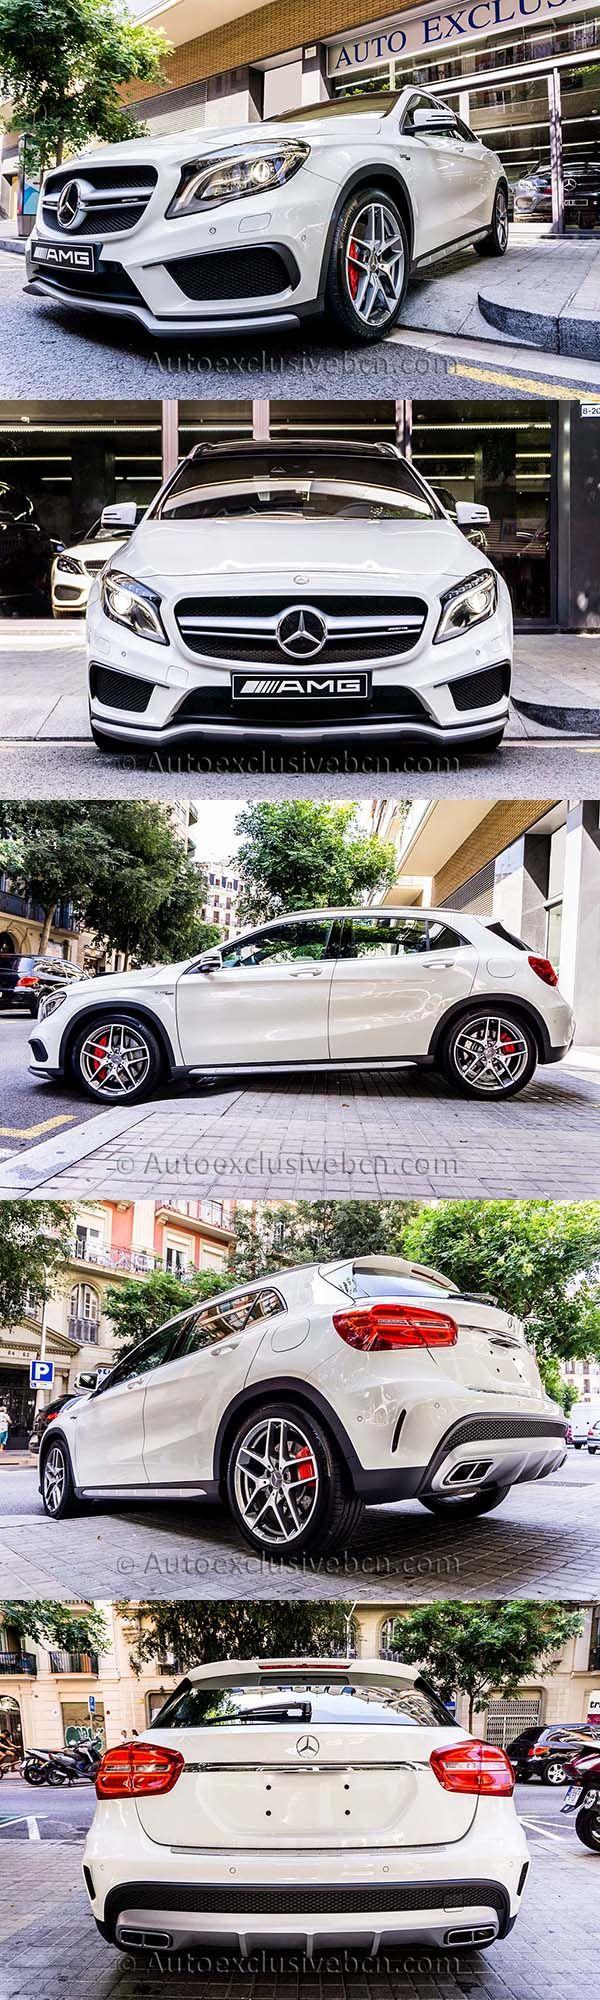 Mercedes GLA 45 AMG | 381 c.v | Blanco | Performance | Auto Exclusive BCN | #MercedesBenz #MercedesAMG #Cars #Coches #GLA45 #AutoExclusiveBCN #Concesionario #4x4 #PerformanceAMG | http://autoexclusivebcn.com